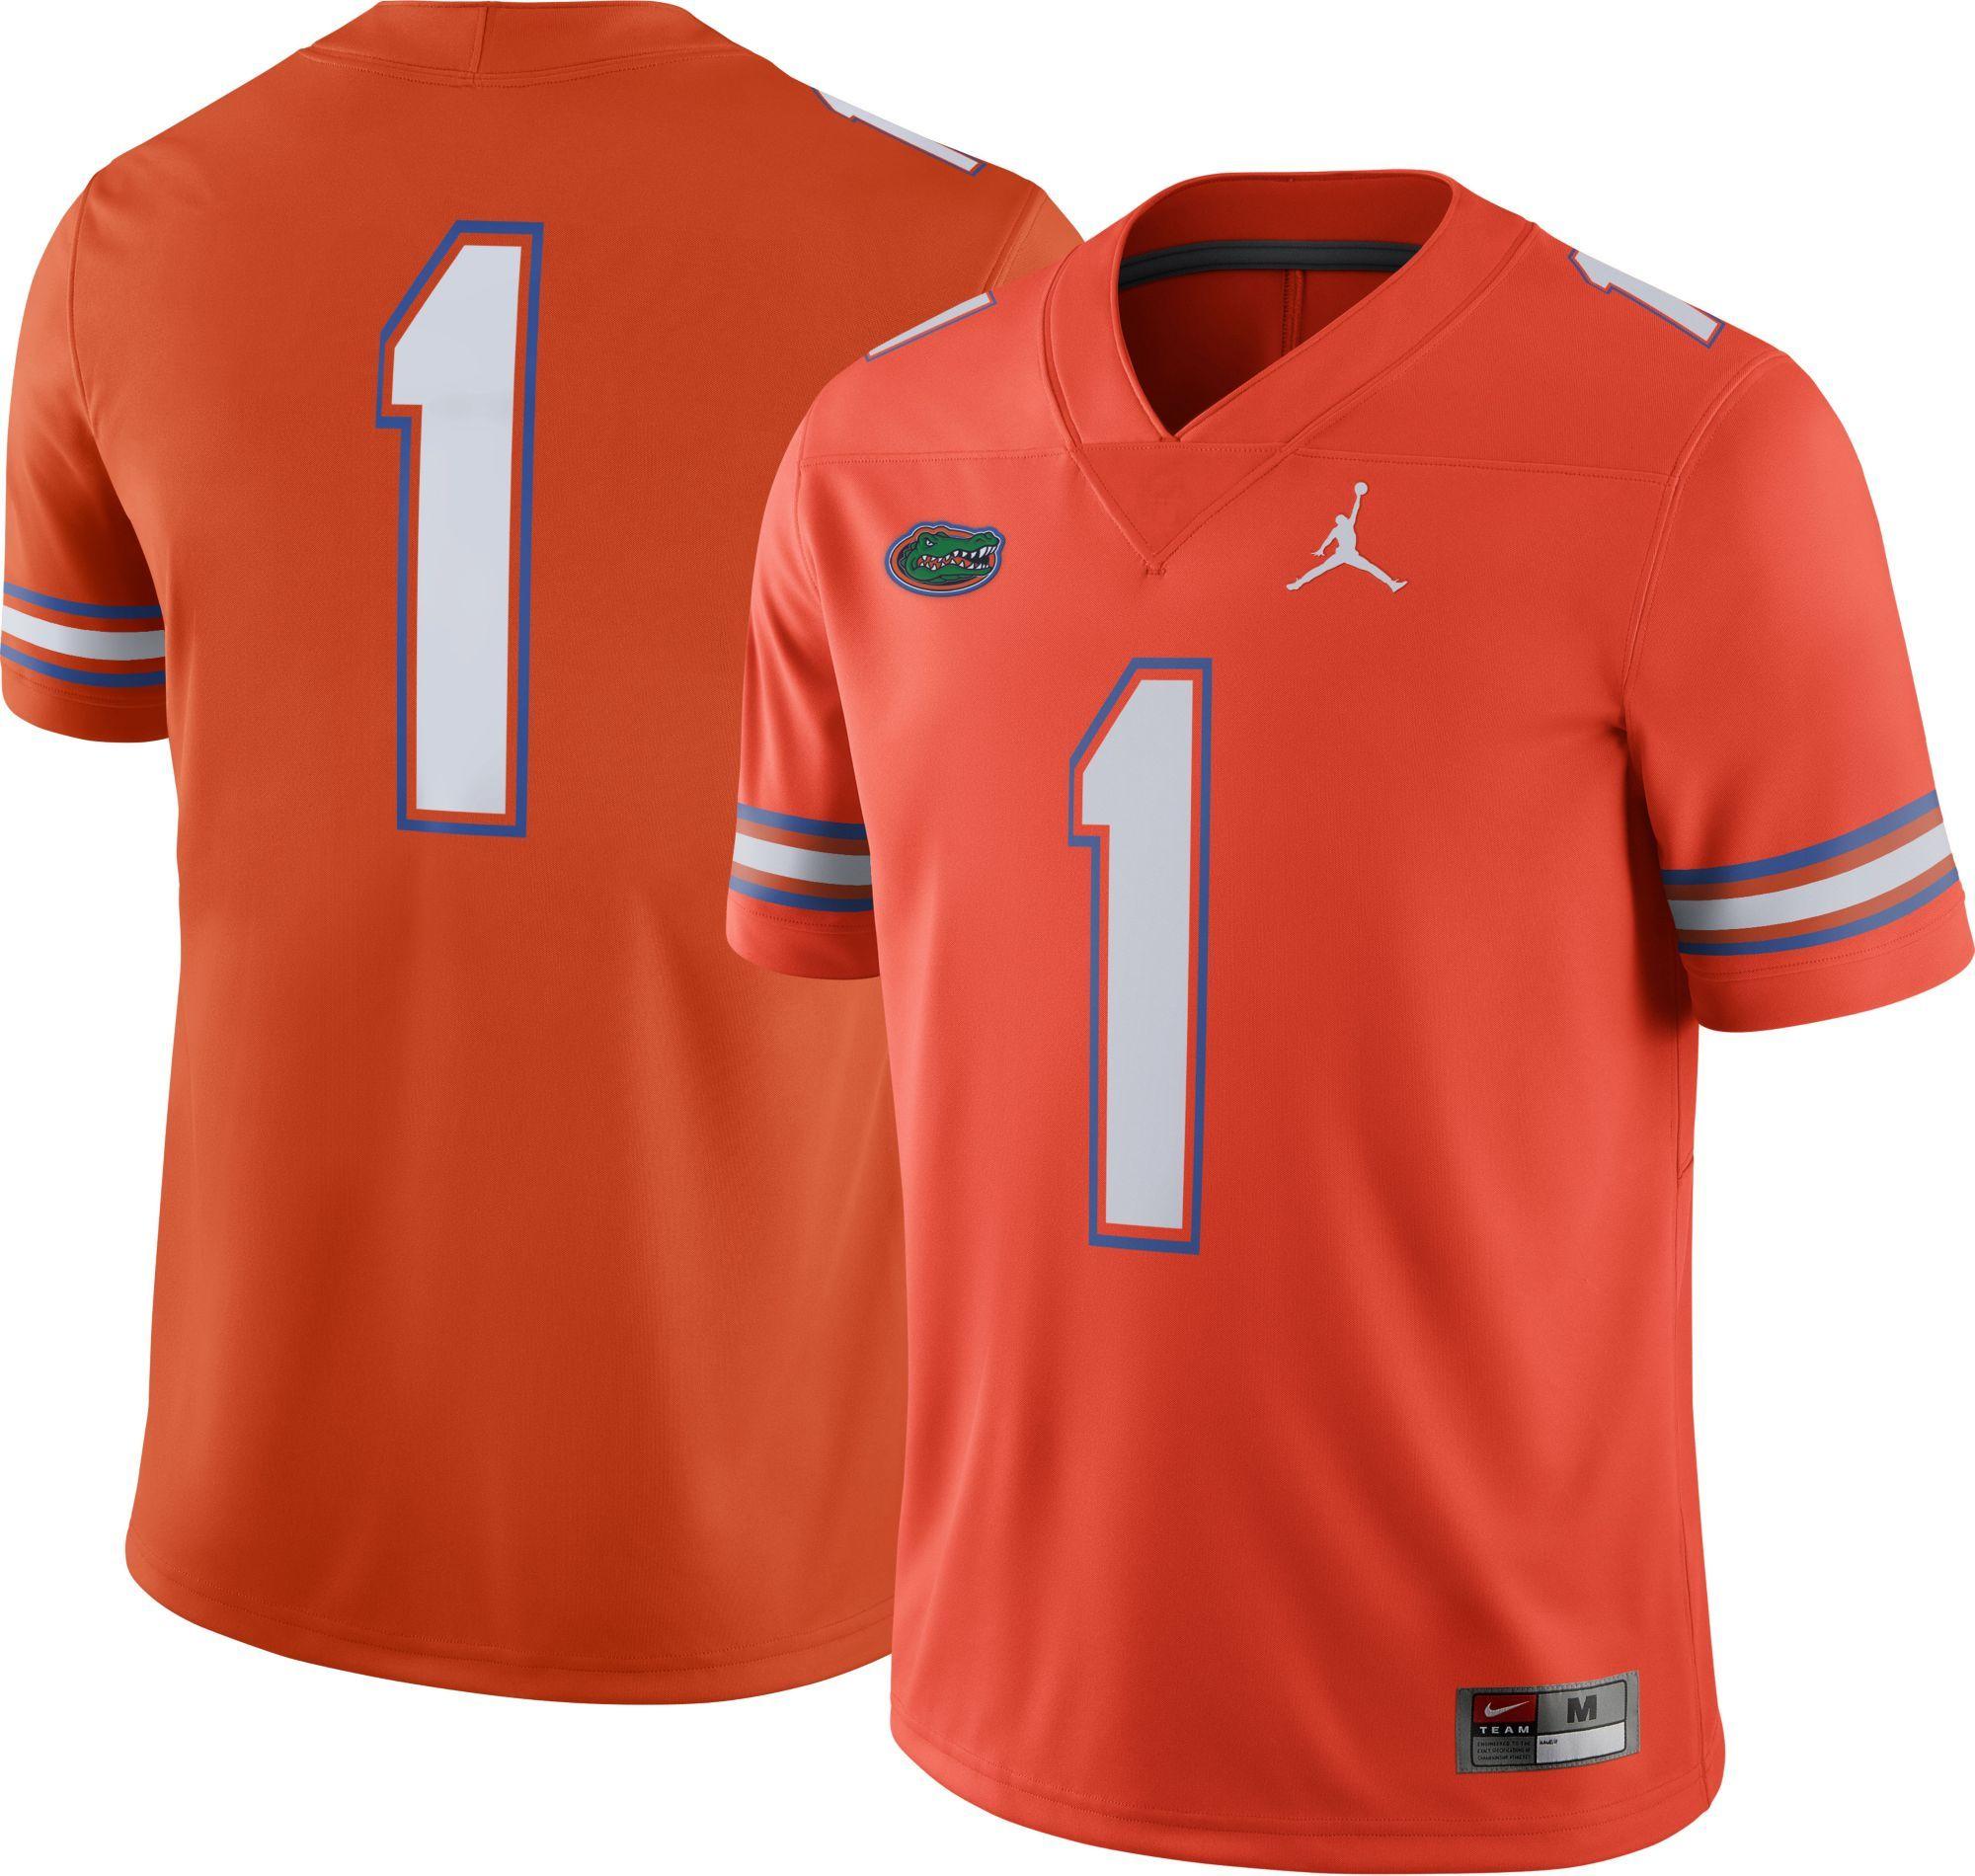 buy online c0f77 1177a Jordan Men's Florida Gators #1 Orange Game Football Jersey ...